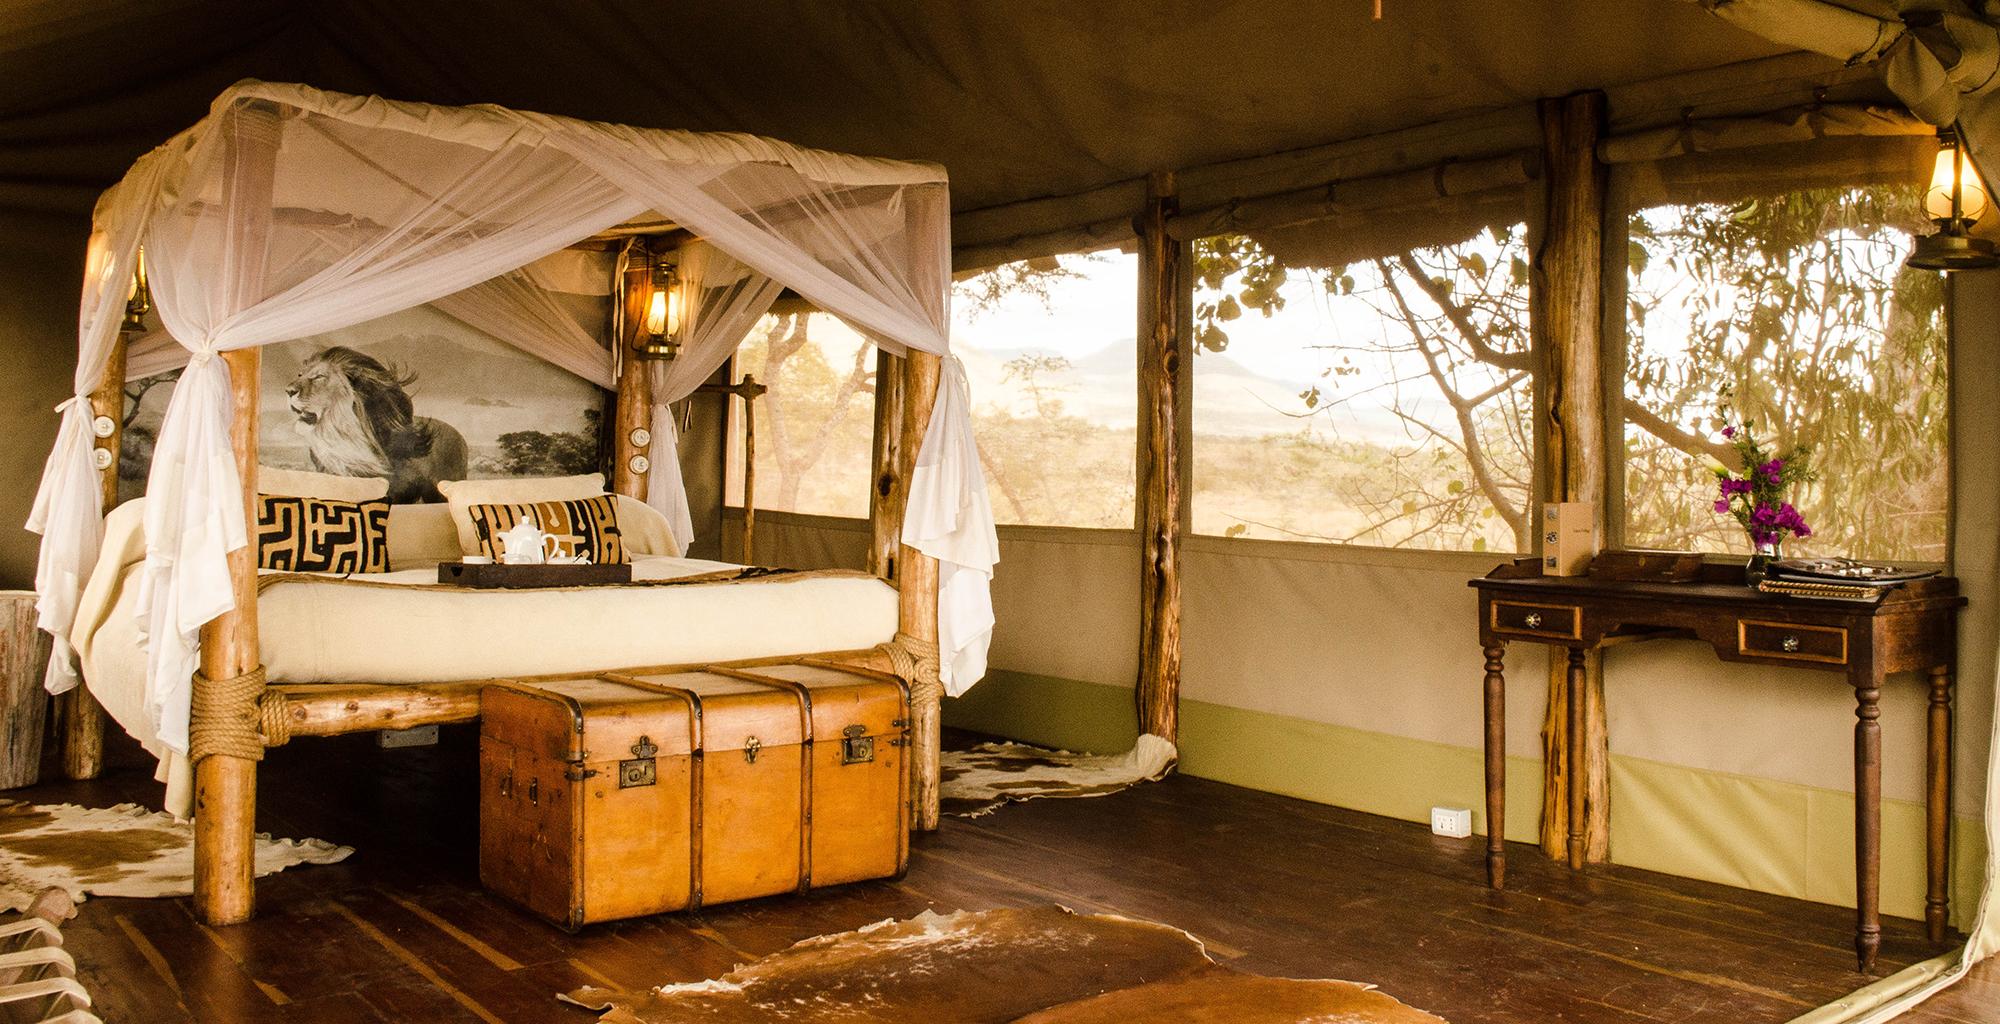 Kenya-Campi-ya-Kanzi-Bedroom